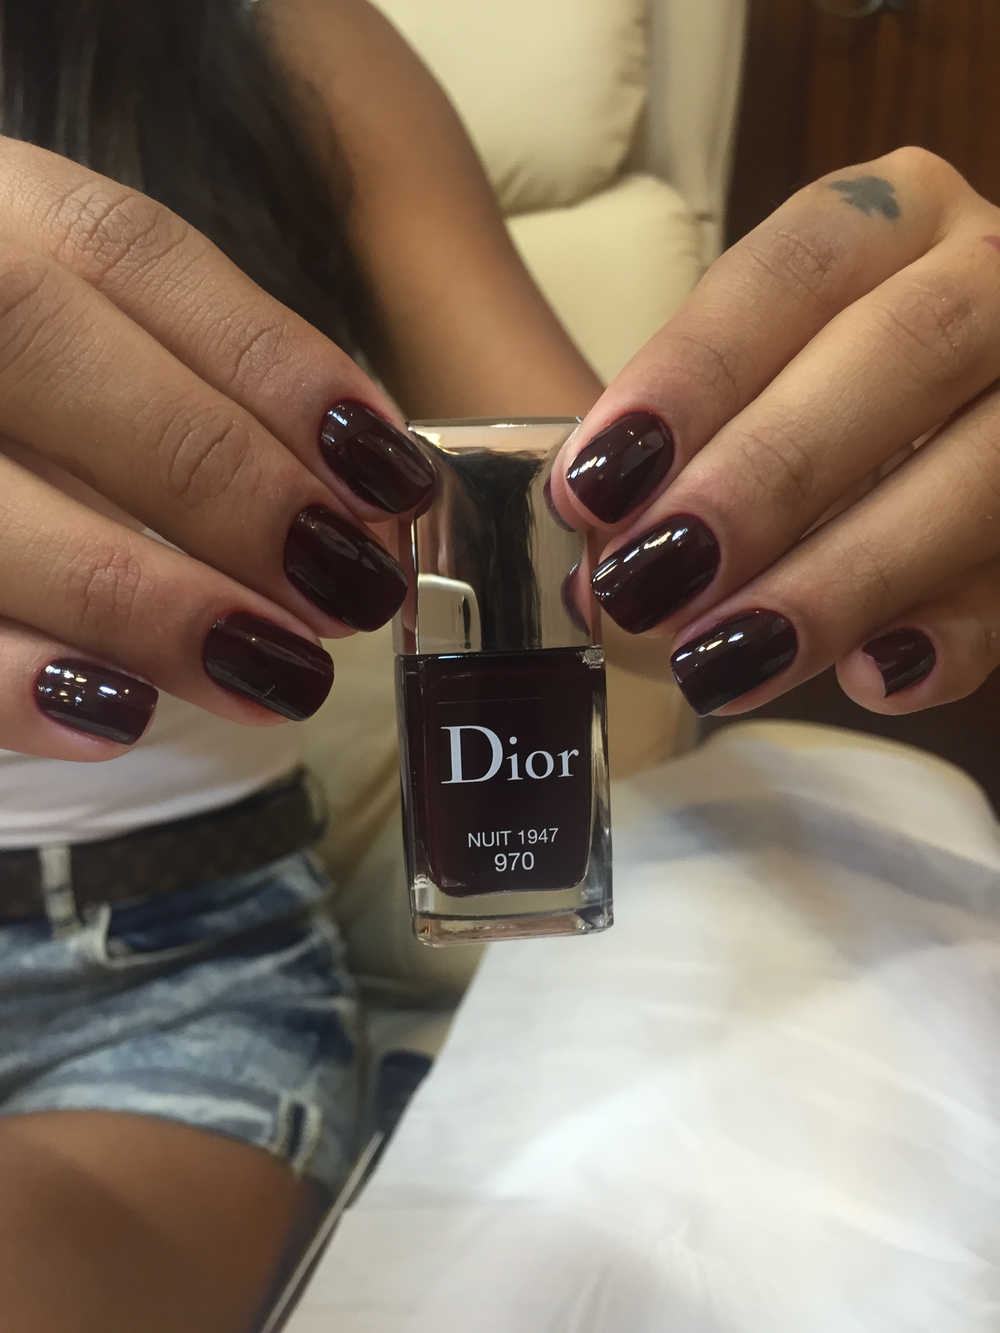 Dior 970